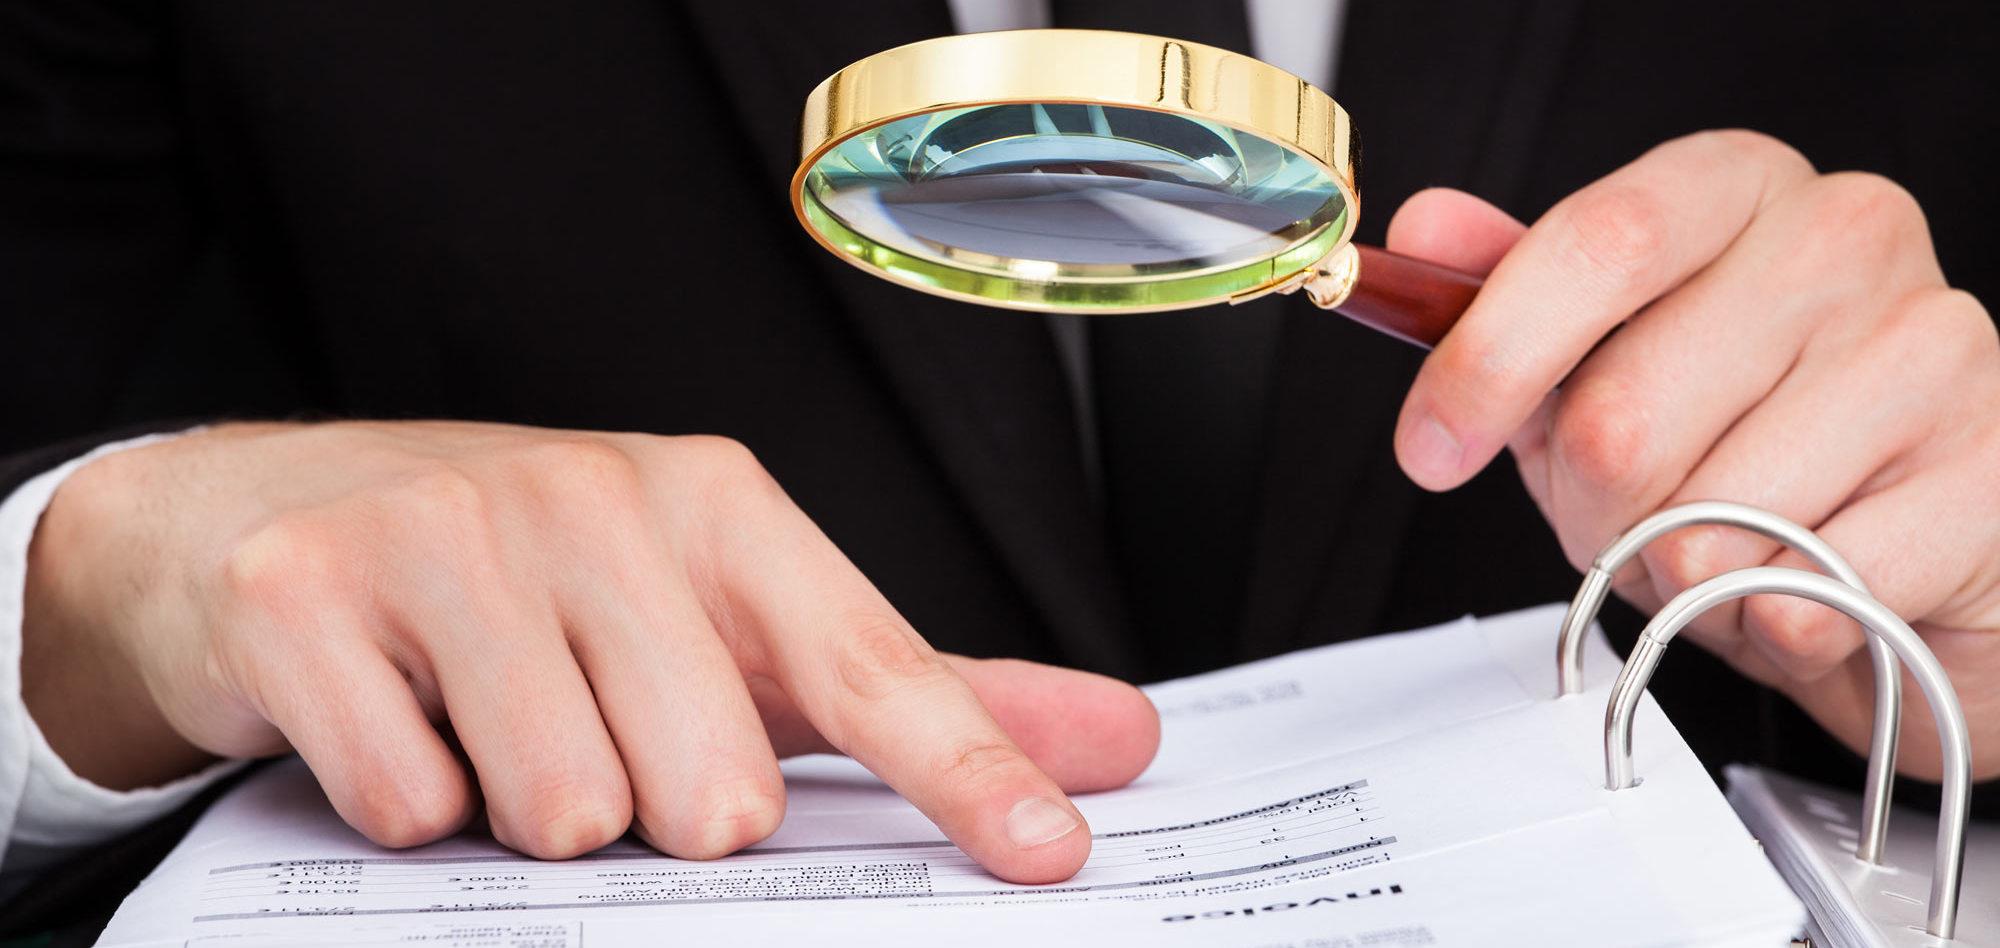 Dedicated private investigator collecting data for investigation in Cincinnati